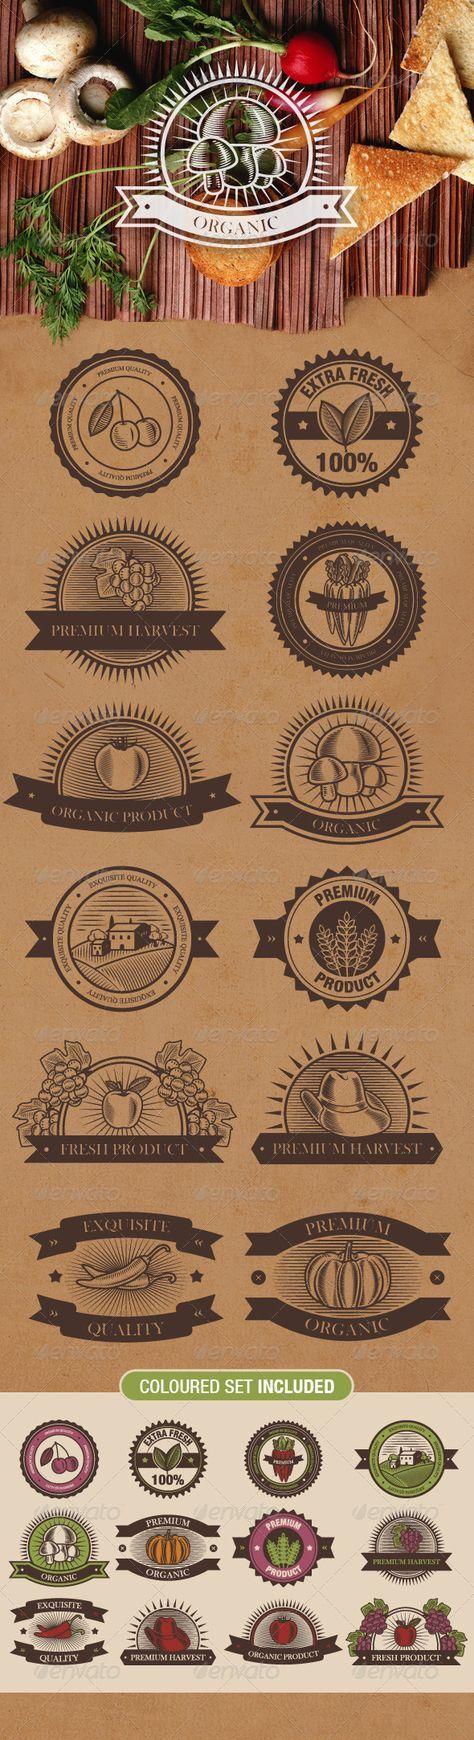 Organic+Green+Retro+Vintage+Badges